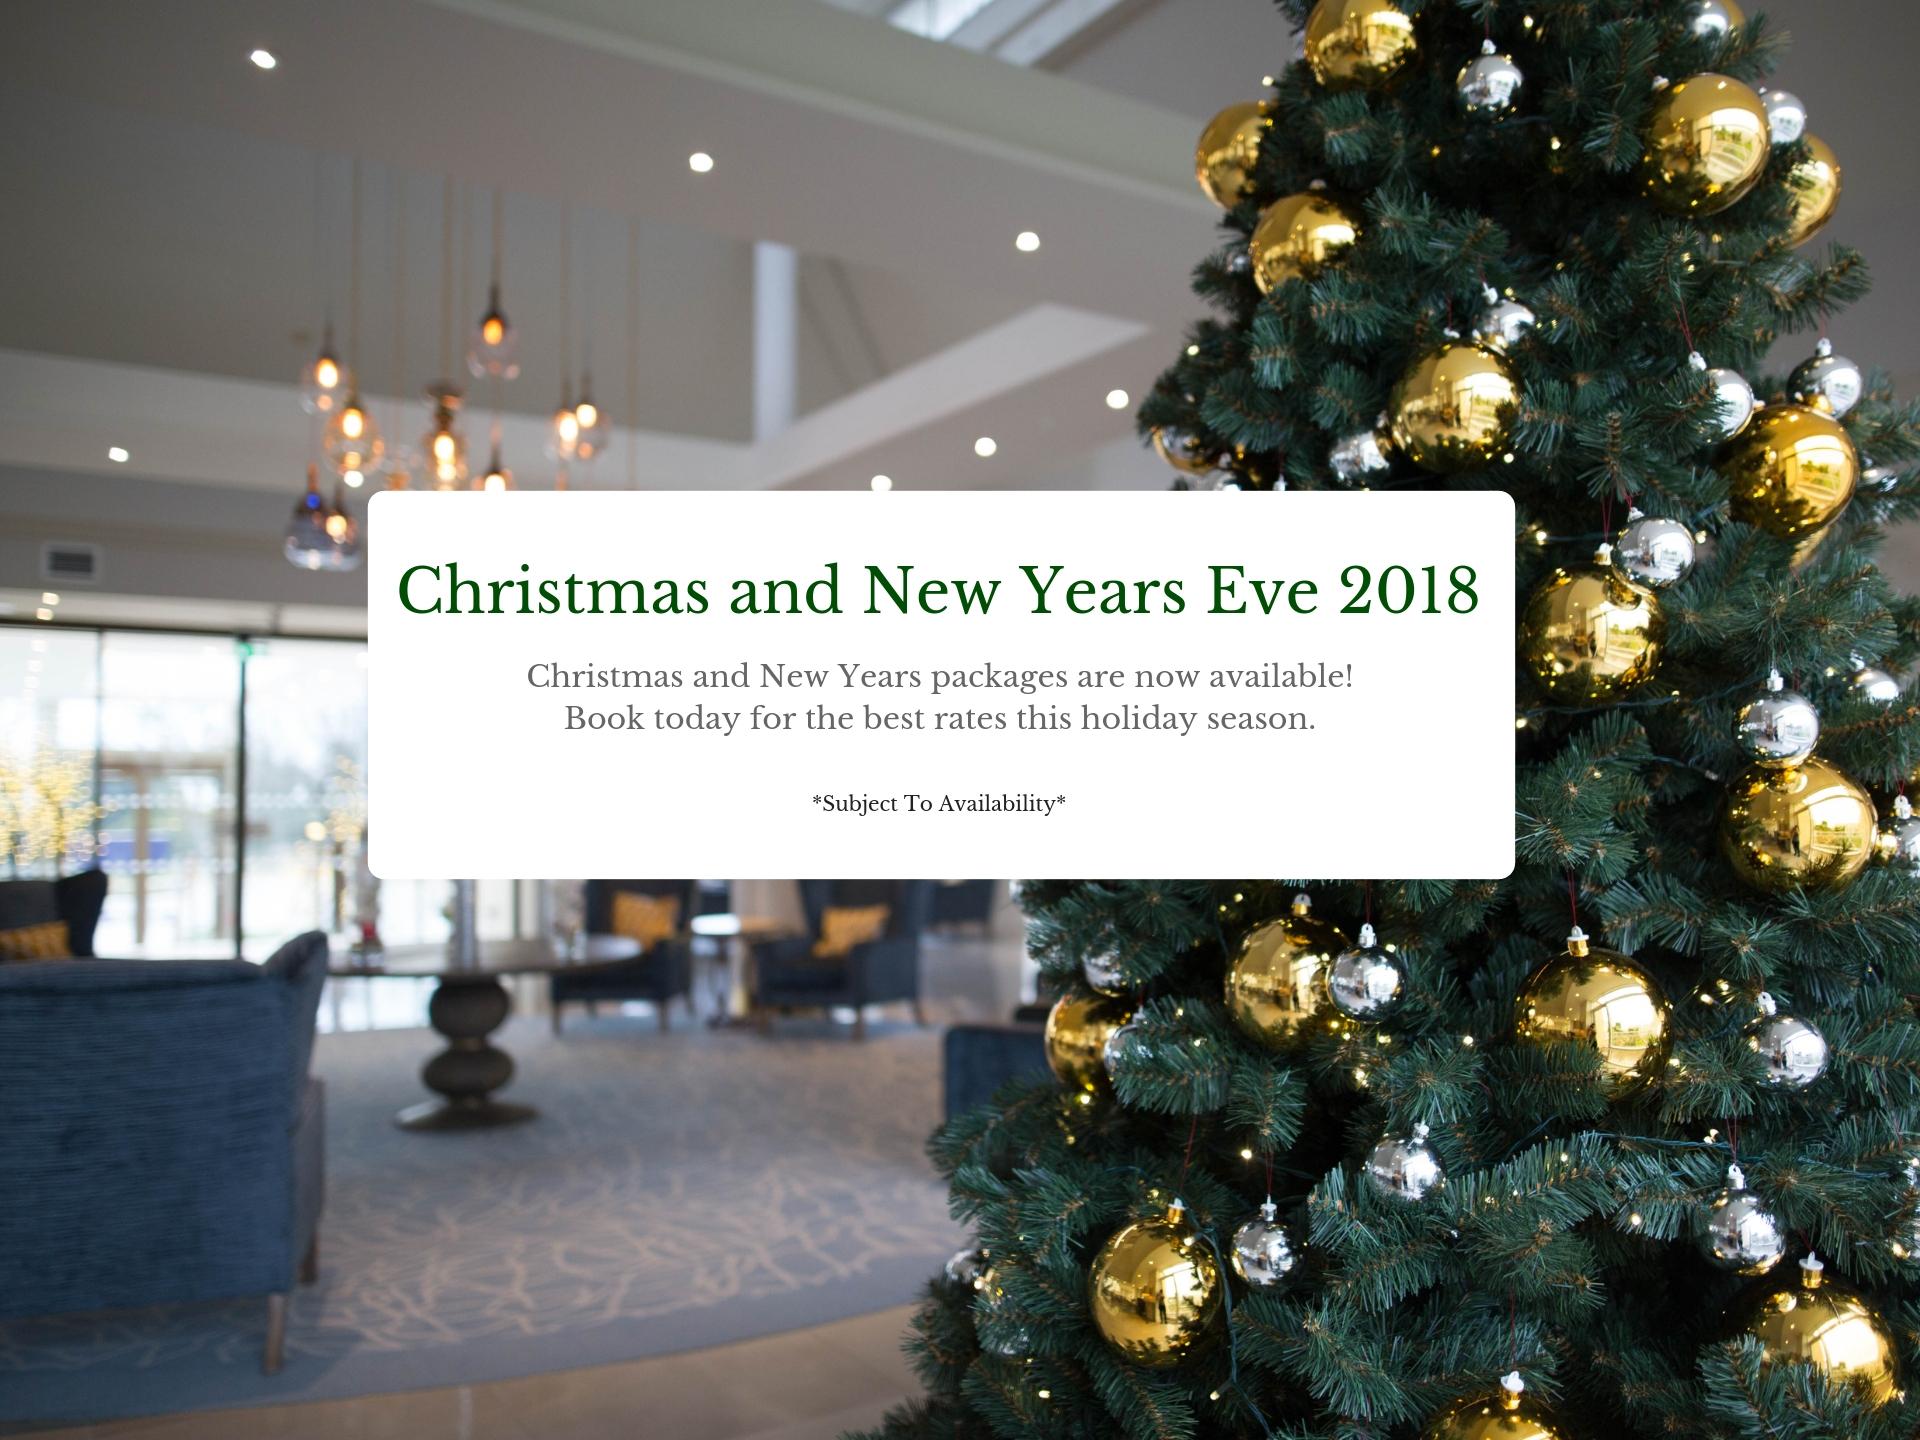 Portmarnock Hotel and Golf Links, Dublin - Book Online & Save 5%